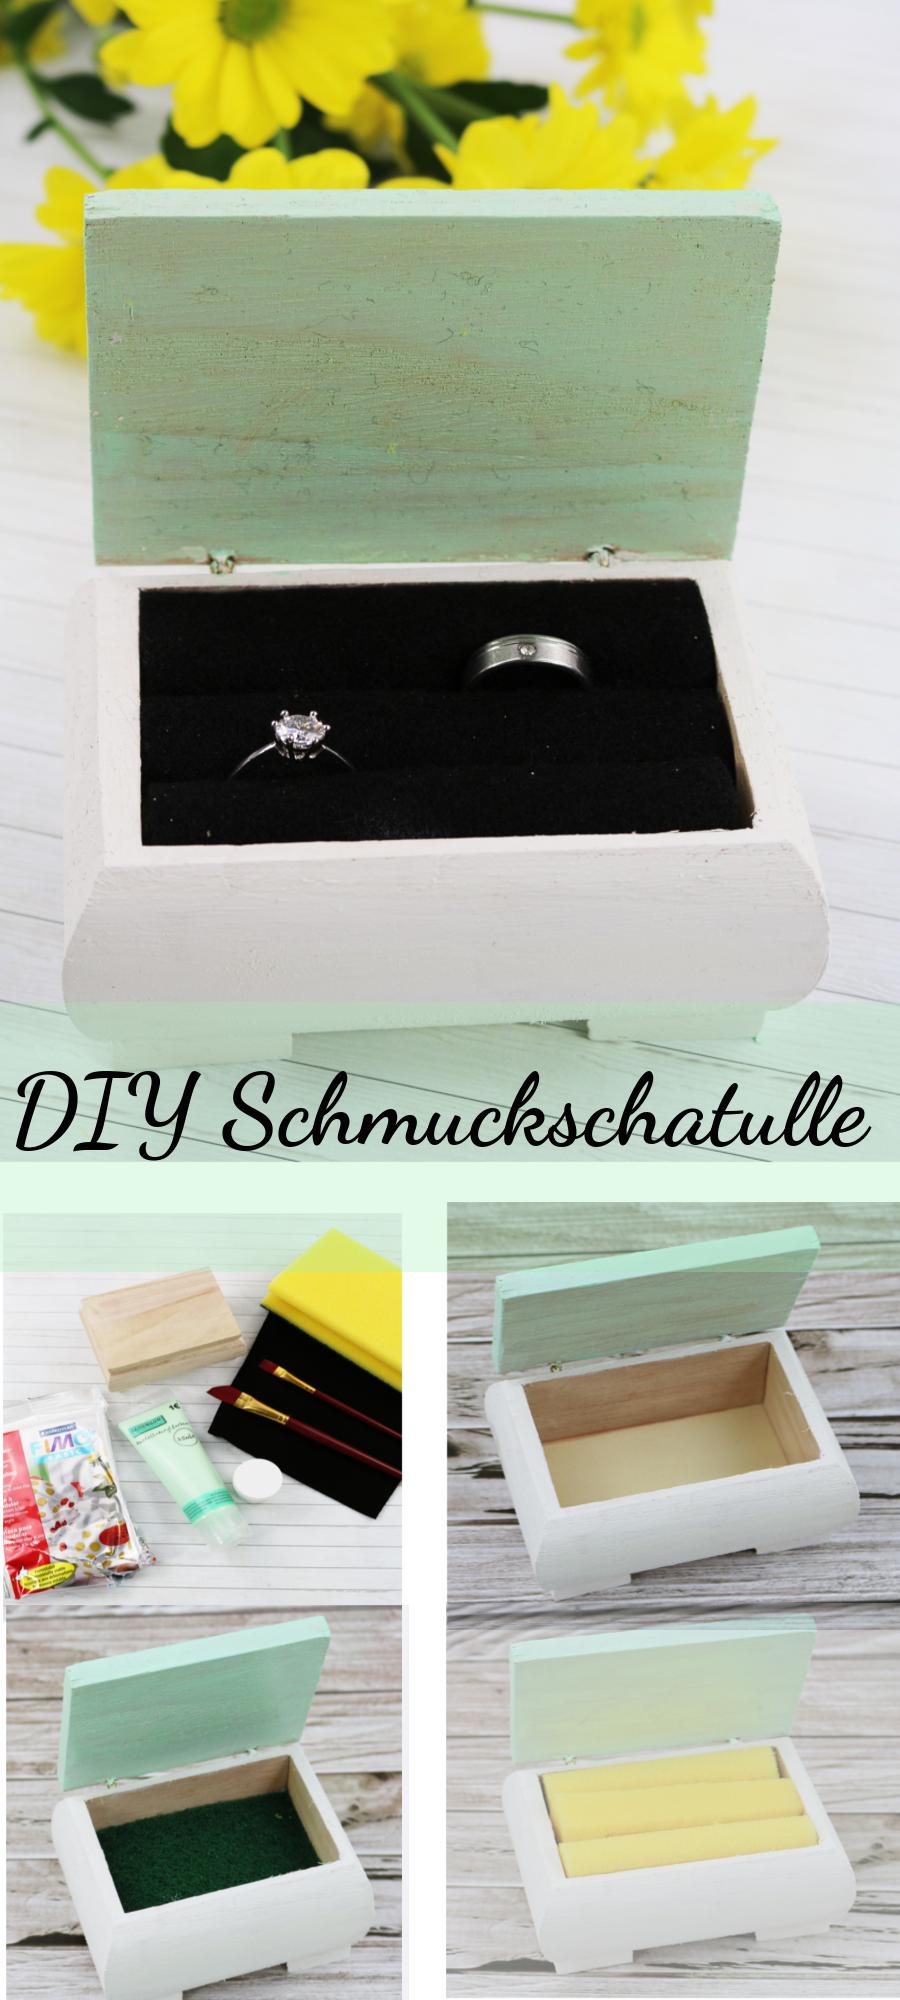 DIY Schmuckschatulle selber machen - Ria Marleen | Upcycling